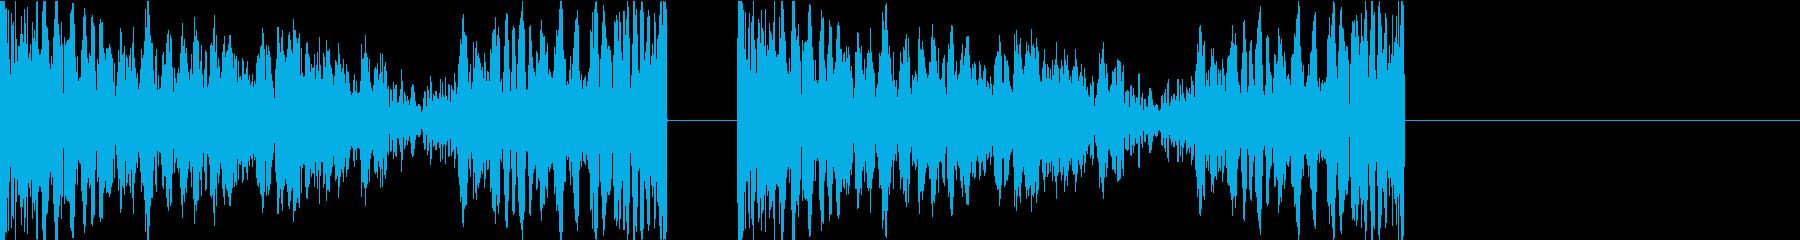 DJプレイ スクラッチ・ノイズ 266の再生済みの波形